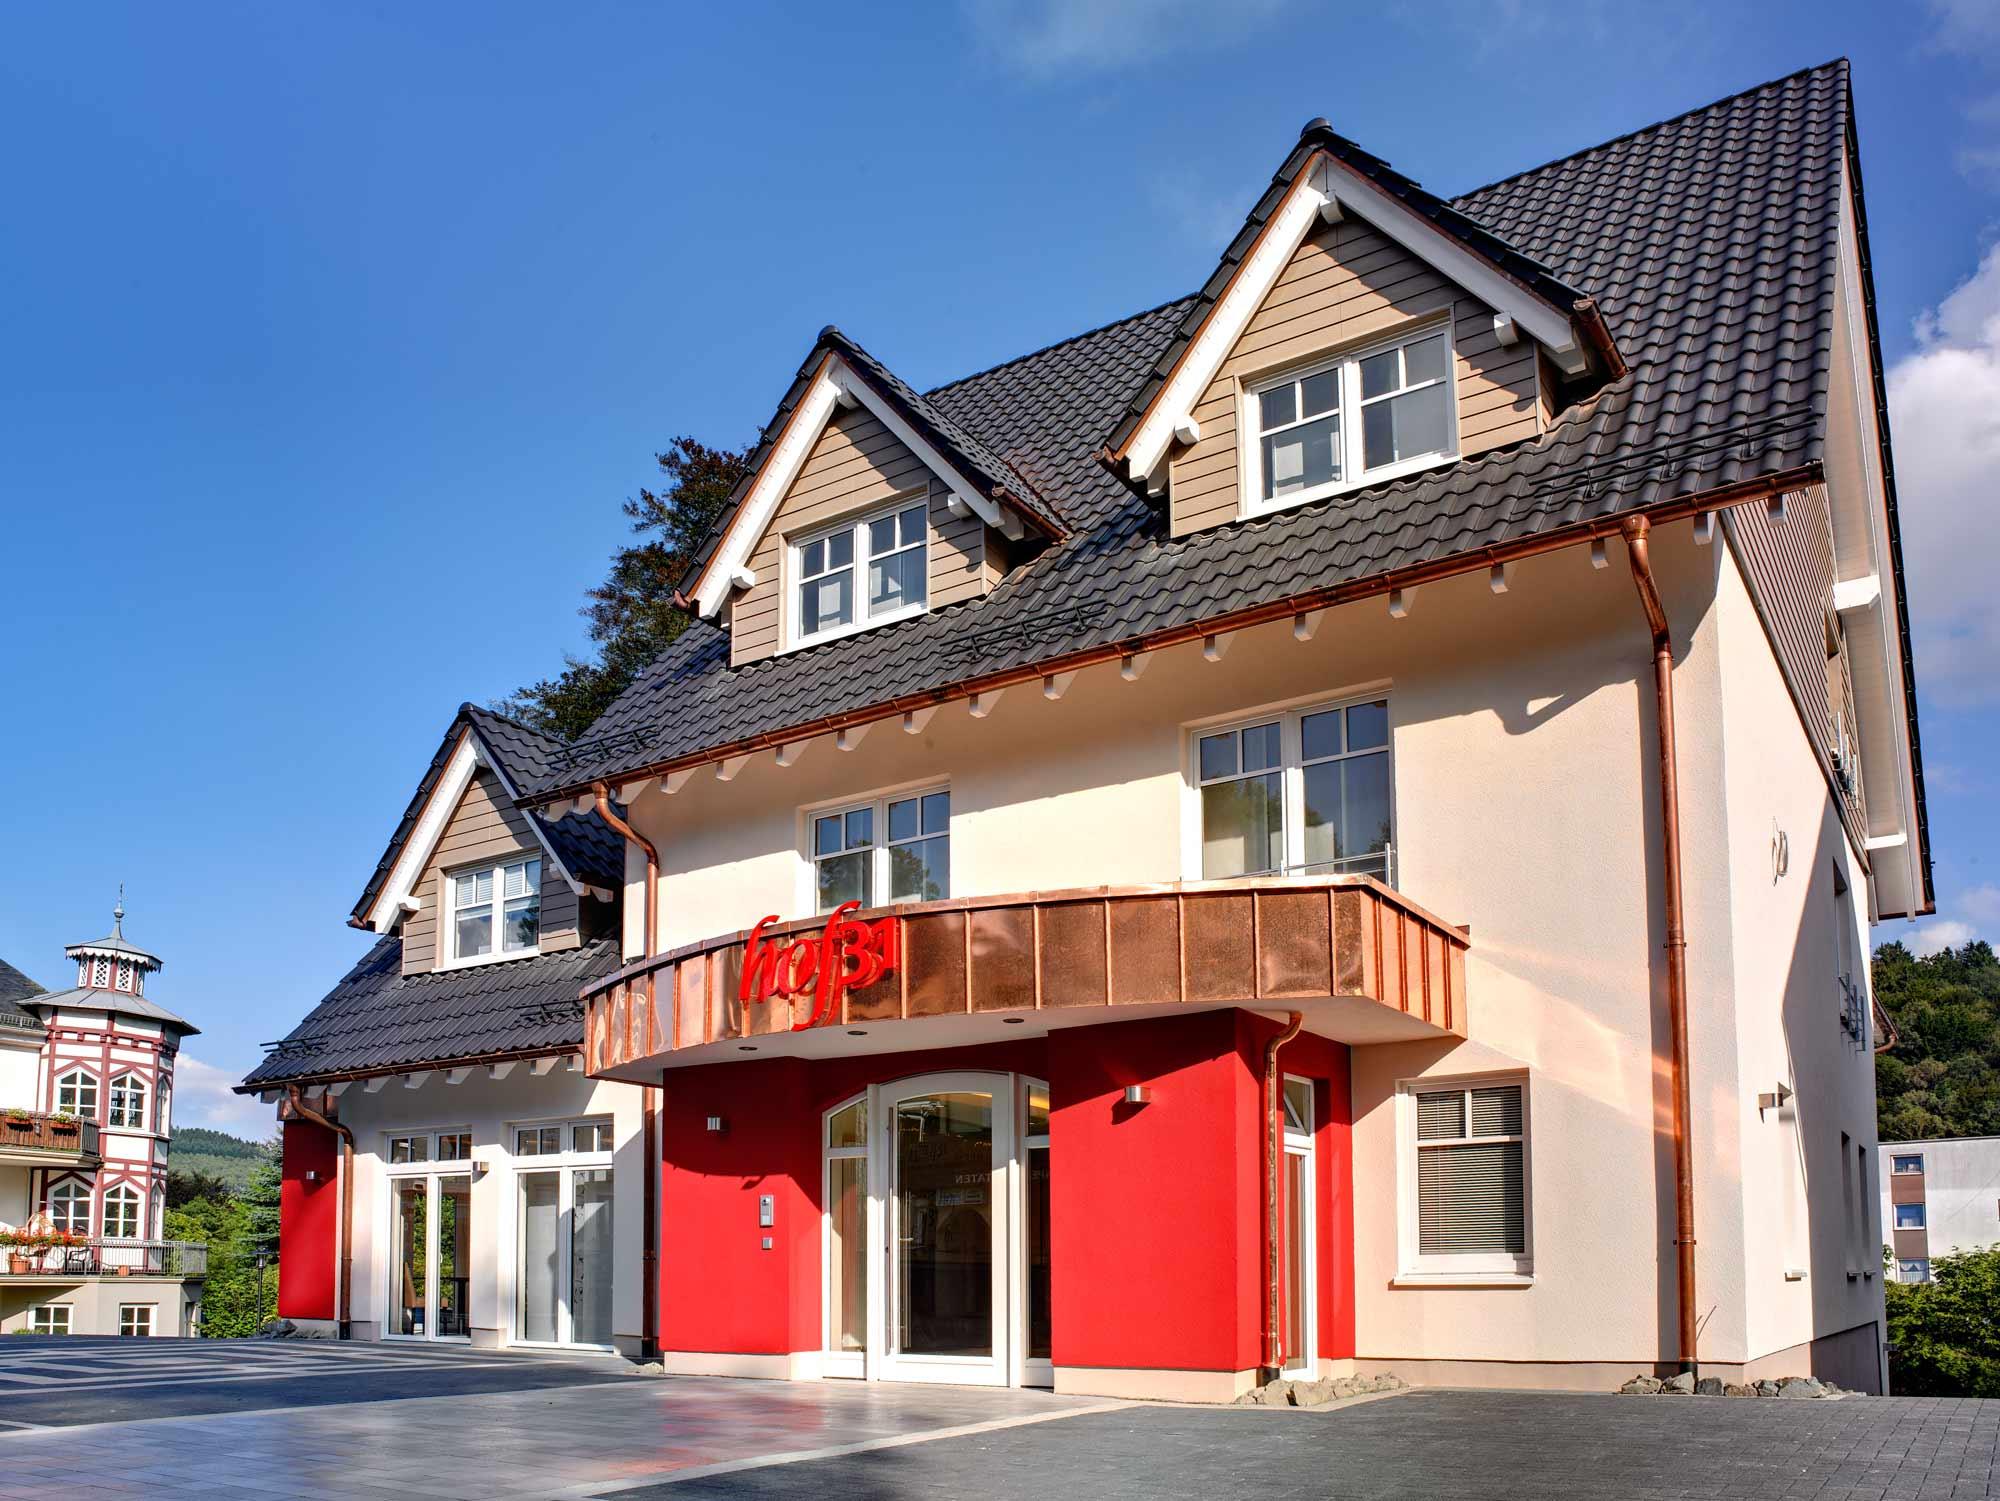 Hotel Garni HOF31